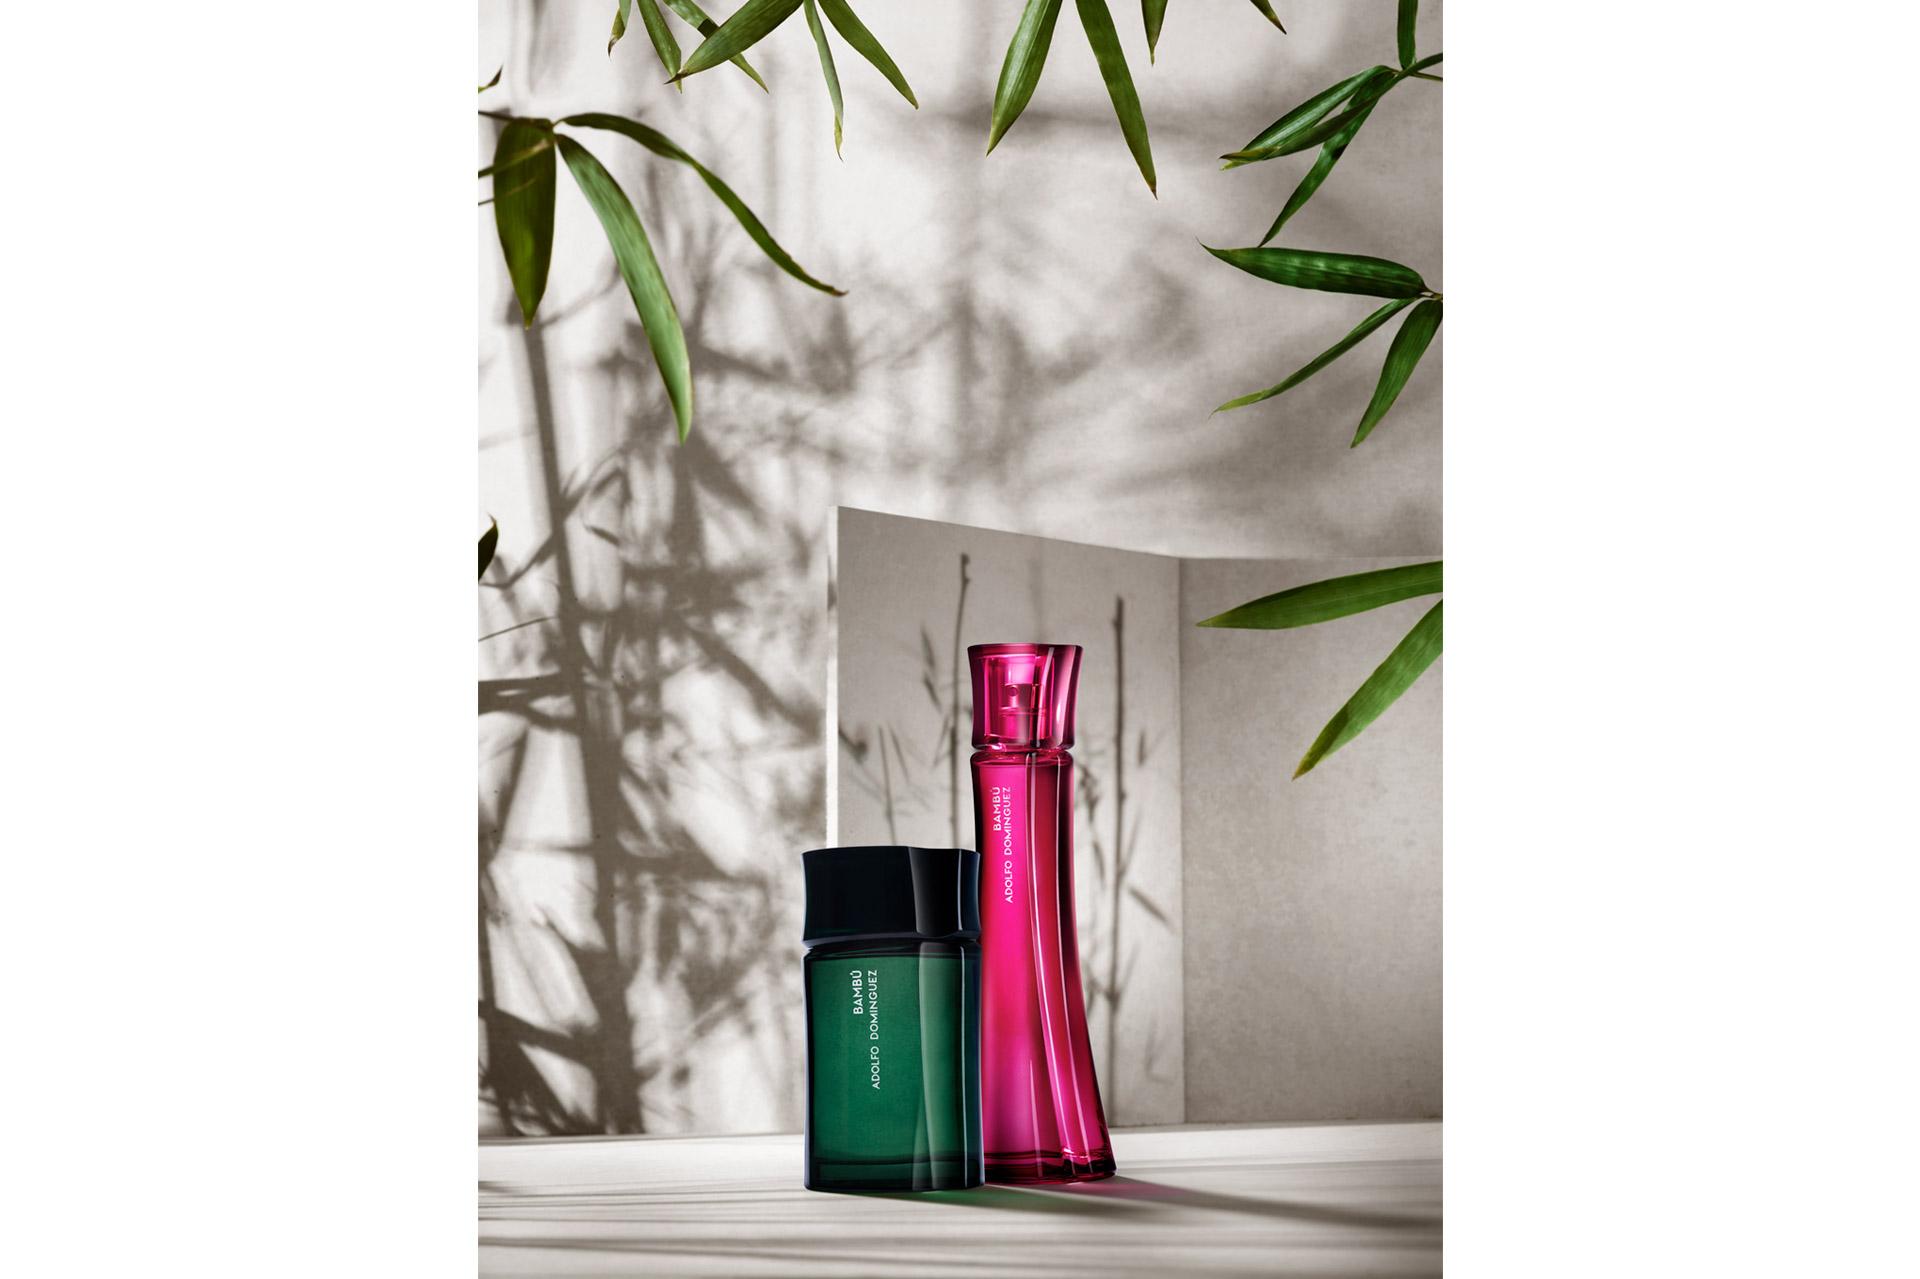 adolfo dominguez colonia bambú | Roig&Portell | Sergi Segarra